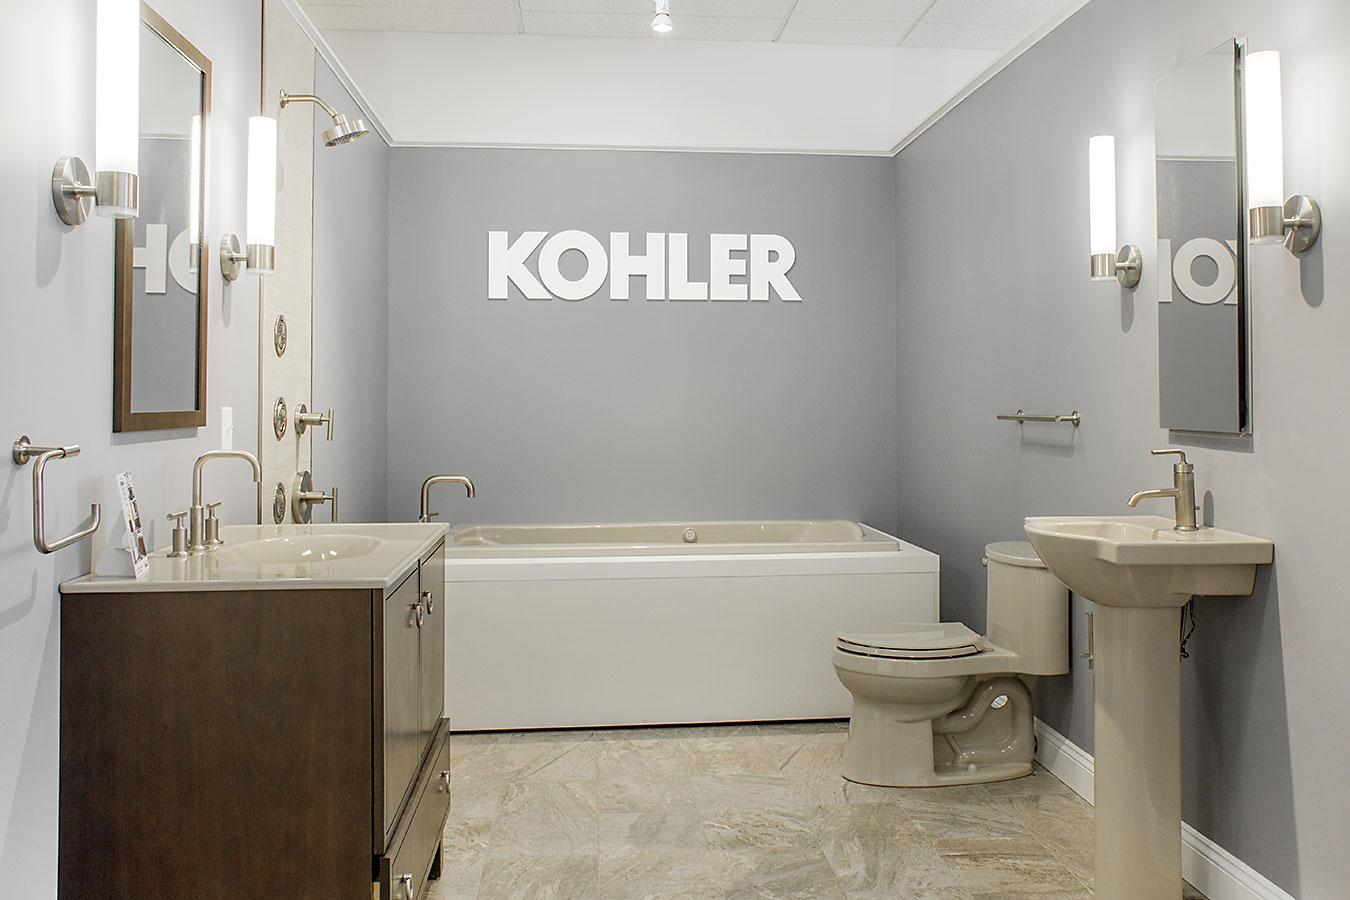 Showroom Gallery Kitchen Bath Showroom Accessories Dartmouth - Bathroom showrooms in ri